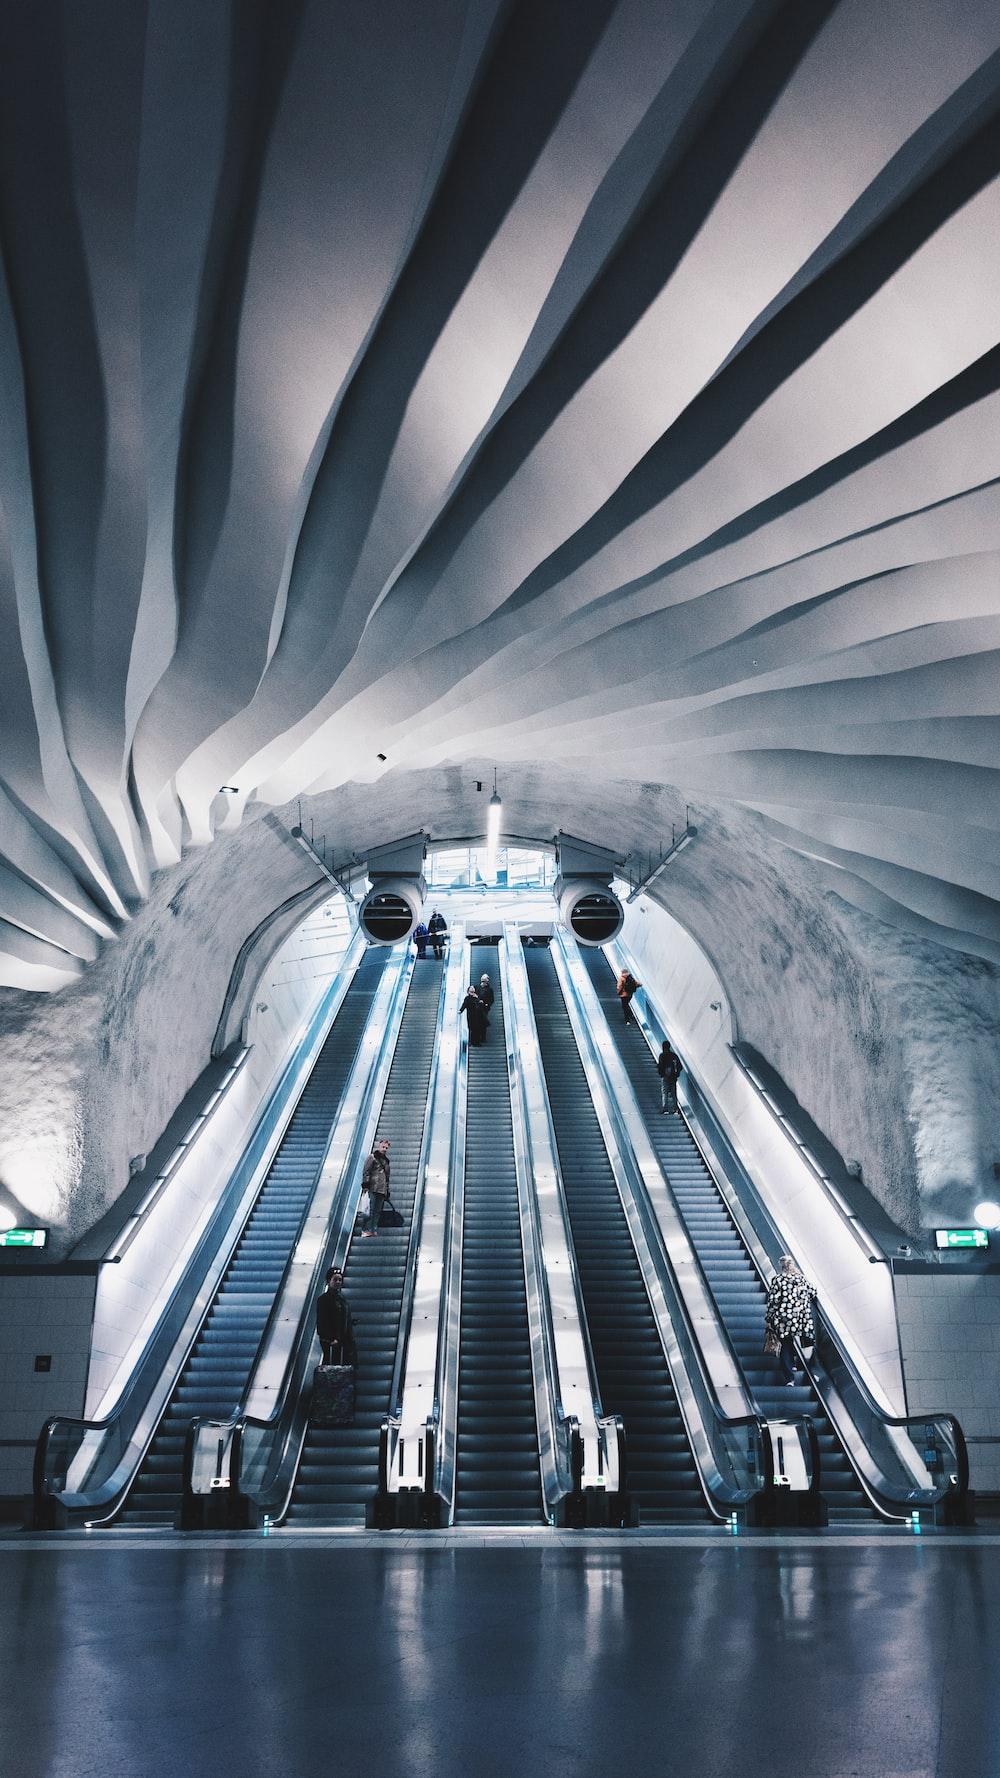 people walk on escalator inside building